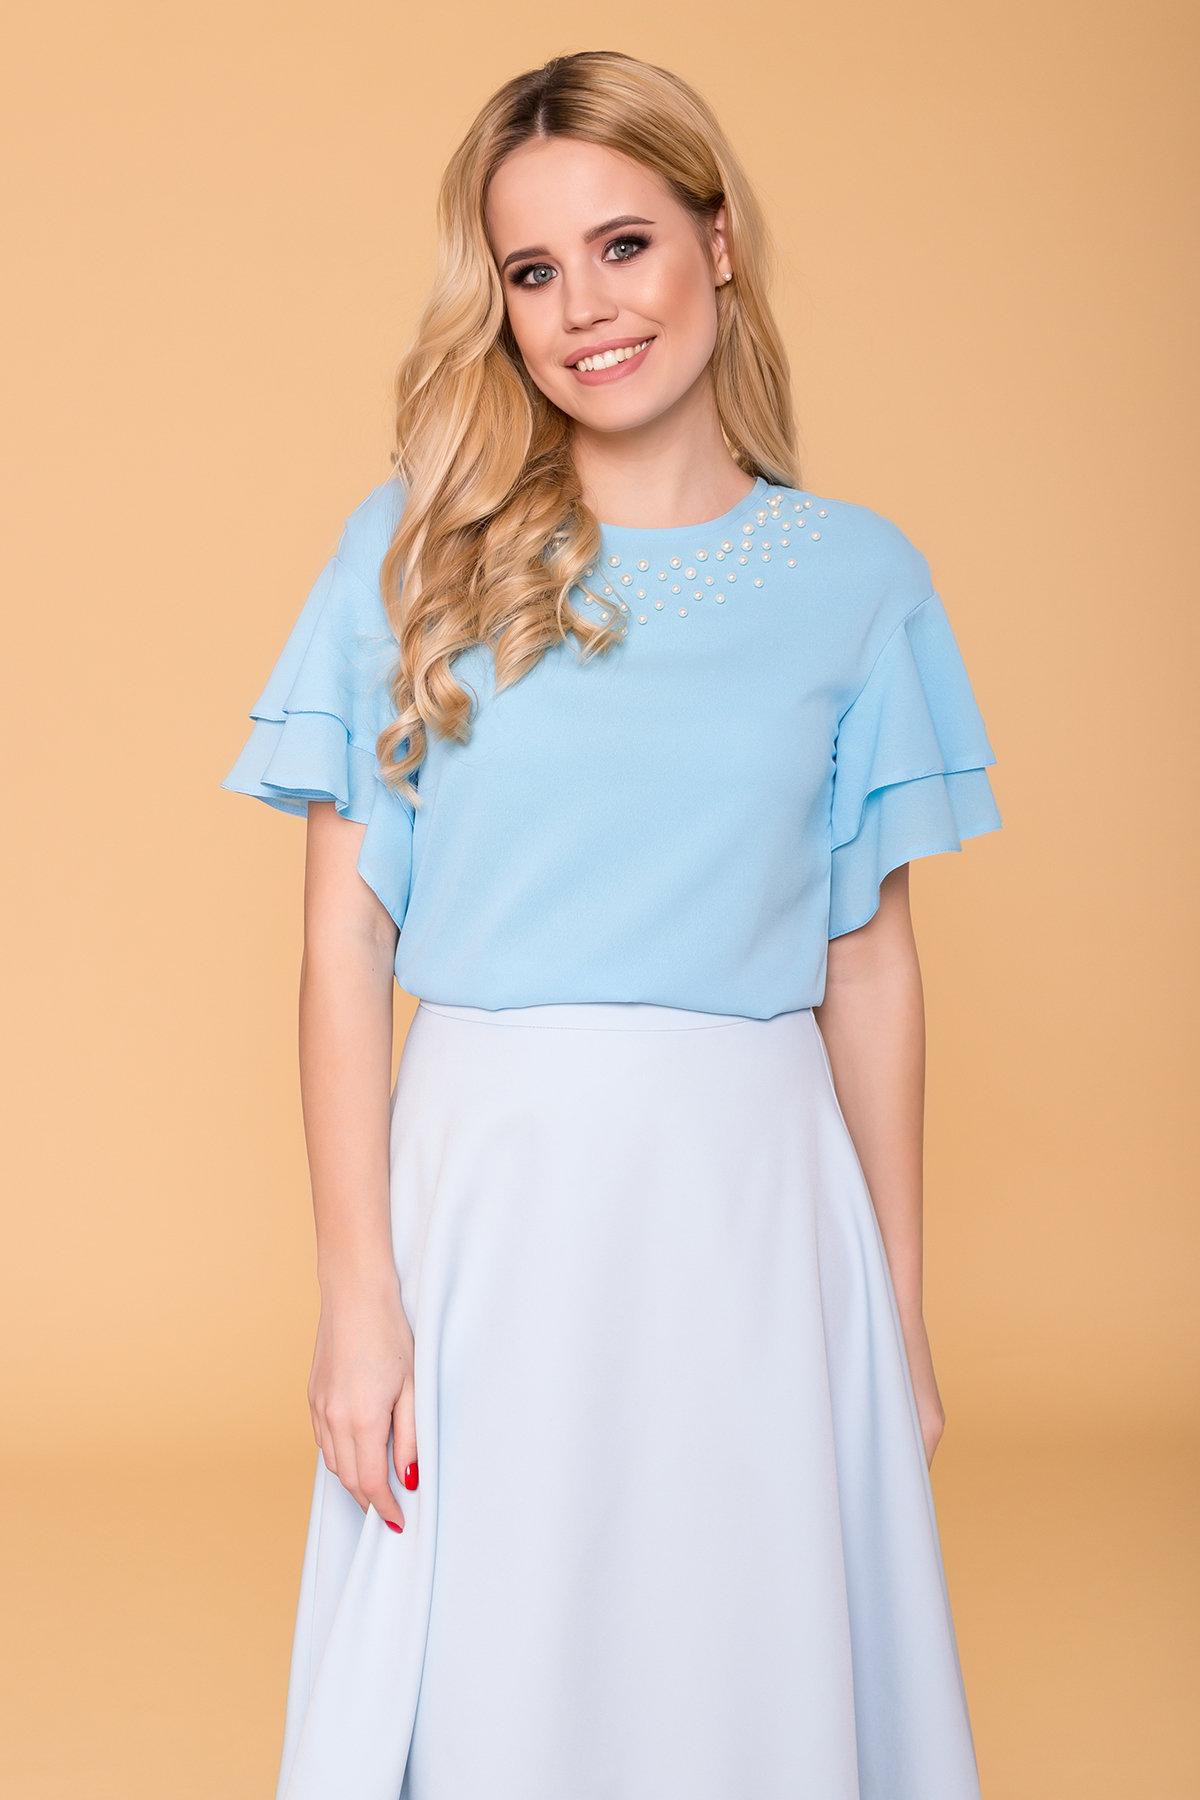 Блуза Мария 4882 АРТ. 34581 Цвет: Голубой - фото 3, интернет магазин tm-modus.ru